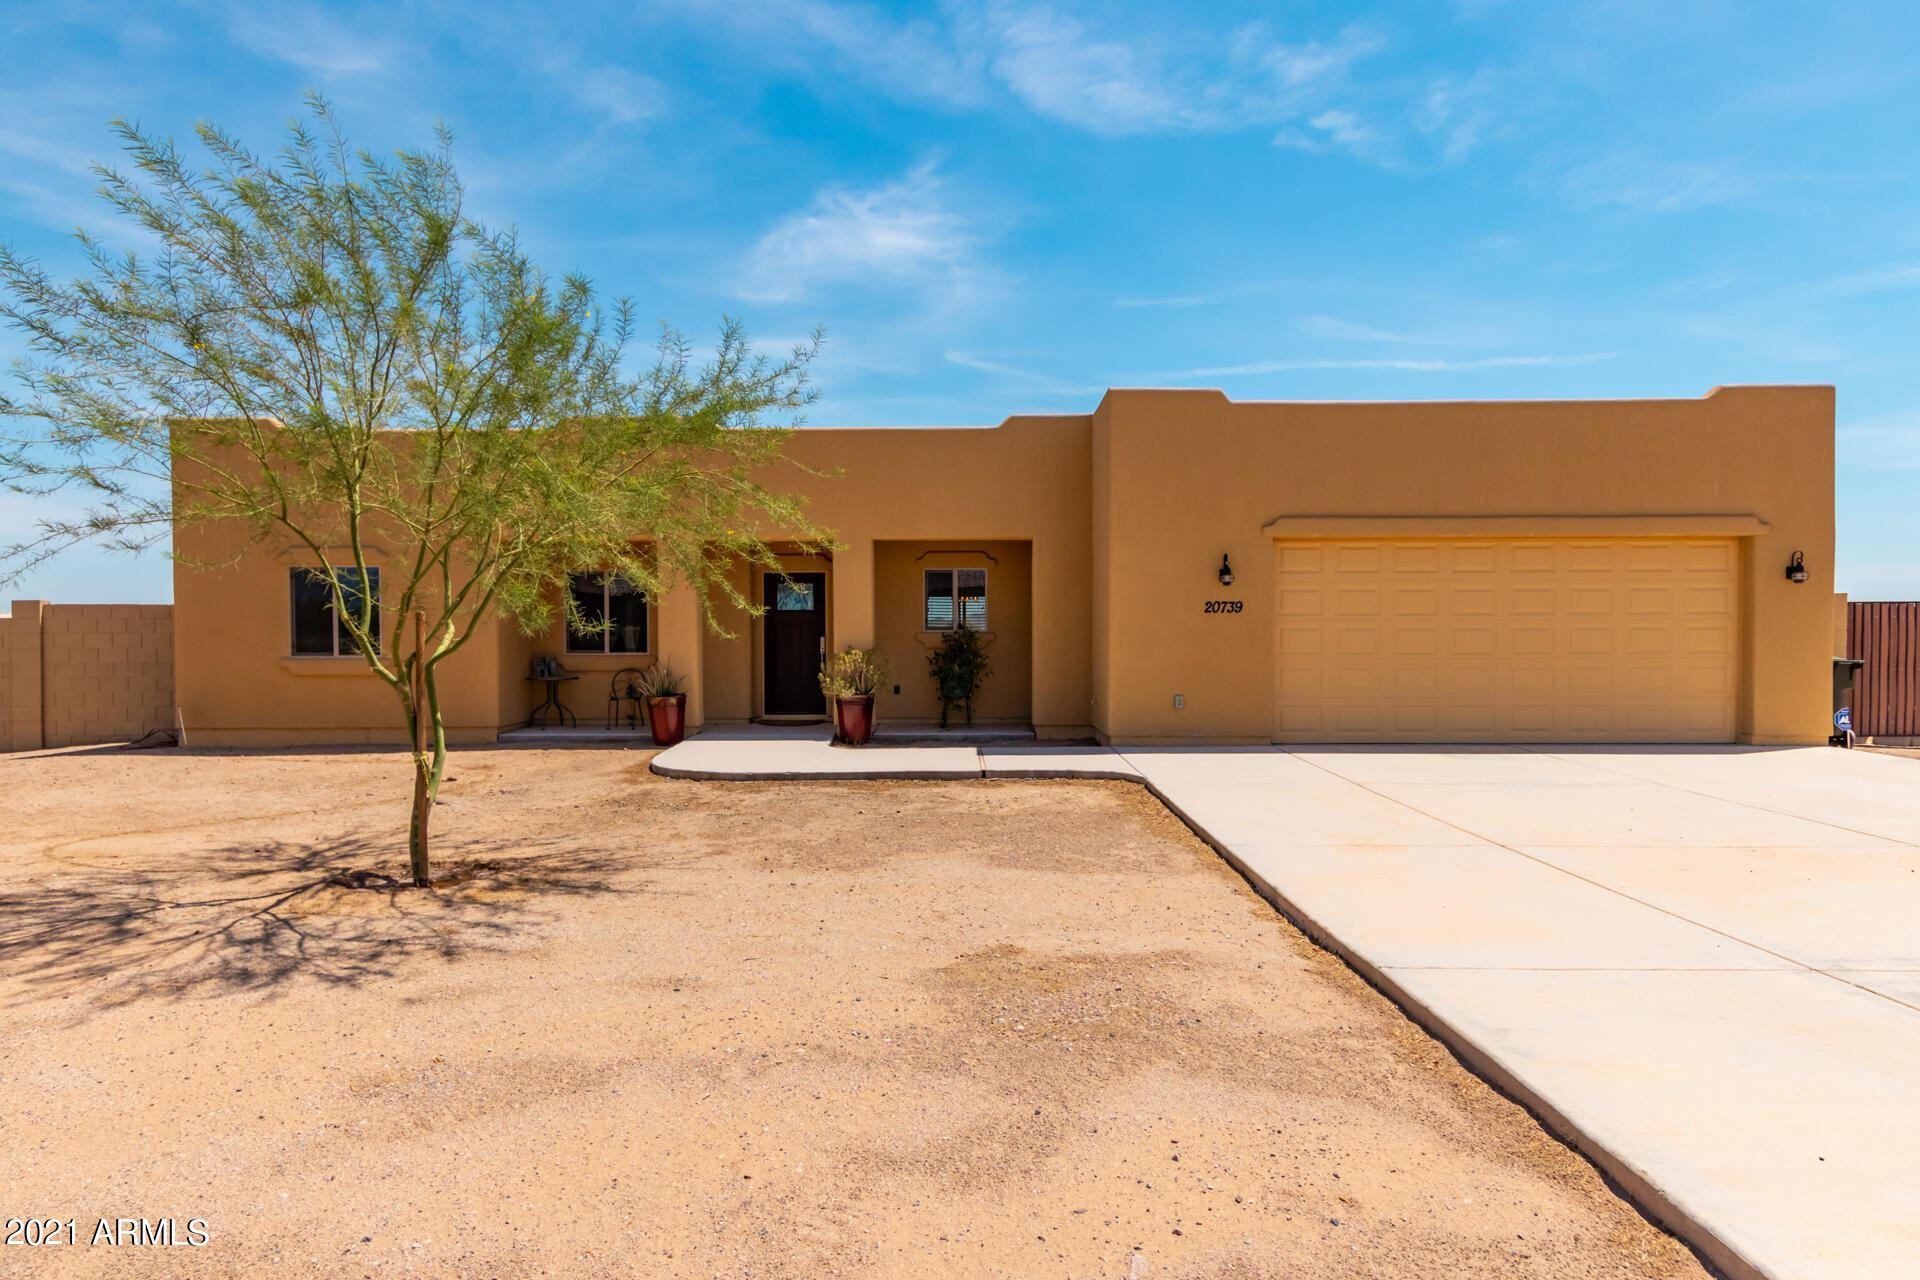 Photo of 20739 W SAGUARO VISTA Drive, Wittmann, AZ 85361 (MLS # 6254906)